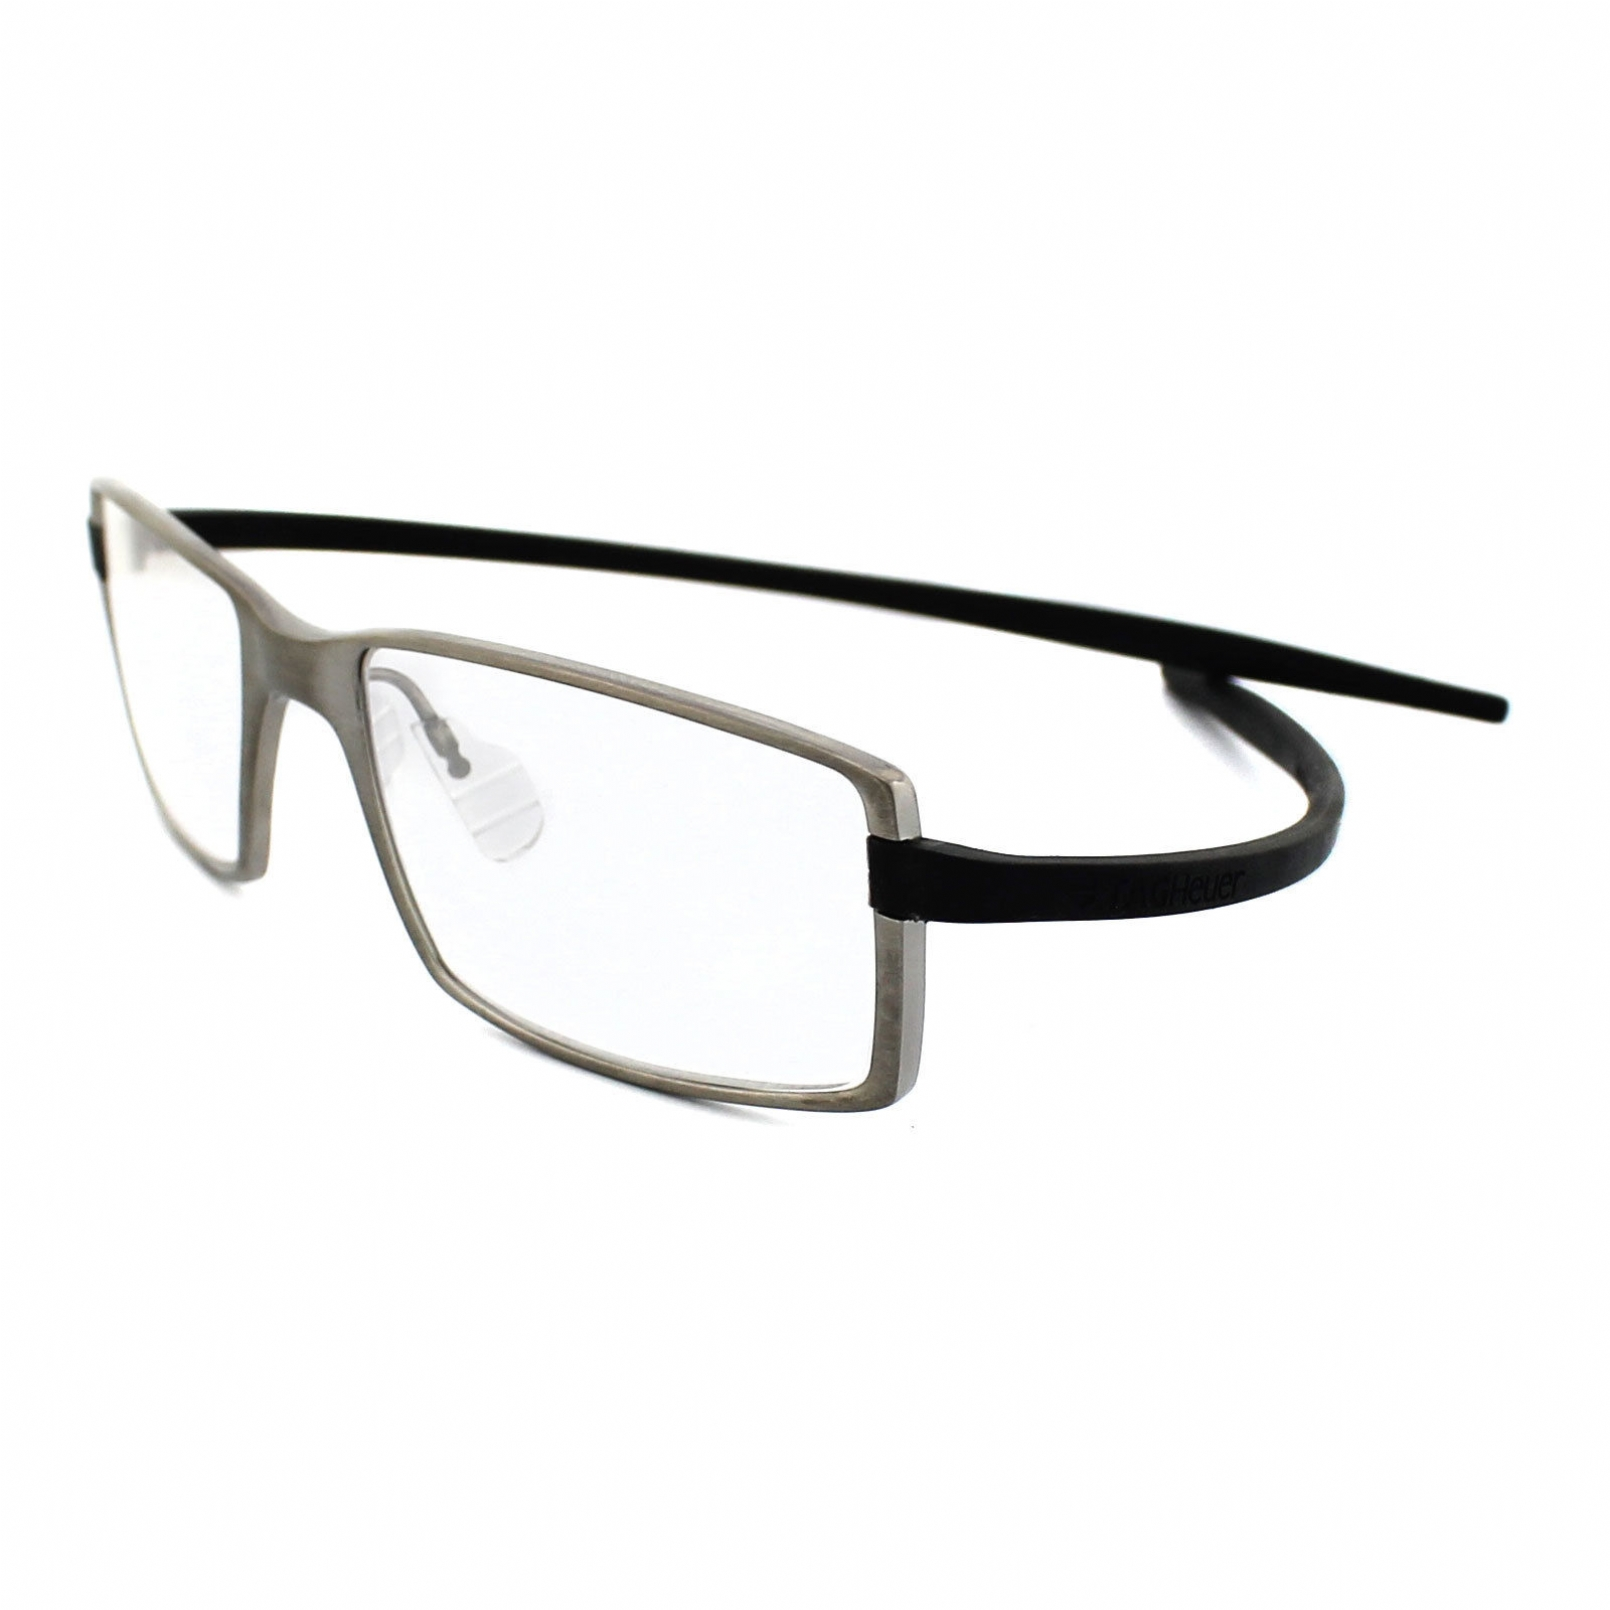 fbf77dc5f8 Buy Tag Heuer Eyeglasses directly from OpticsFast.com